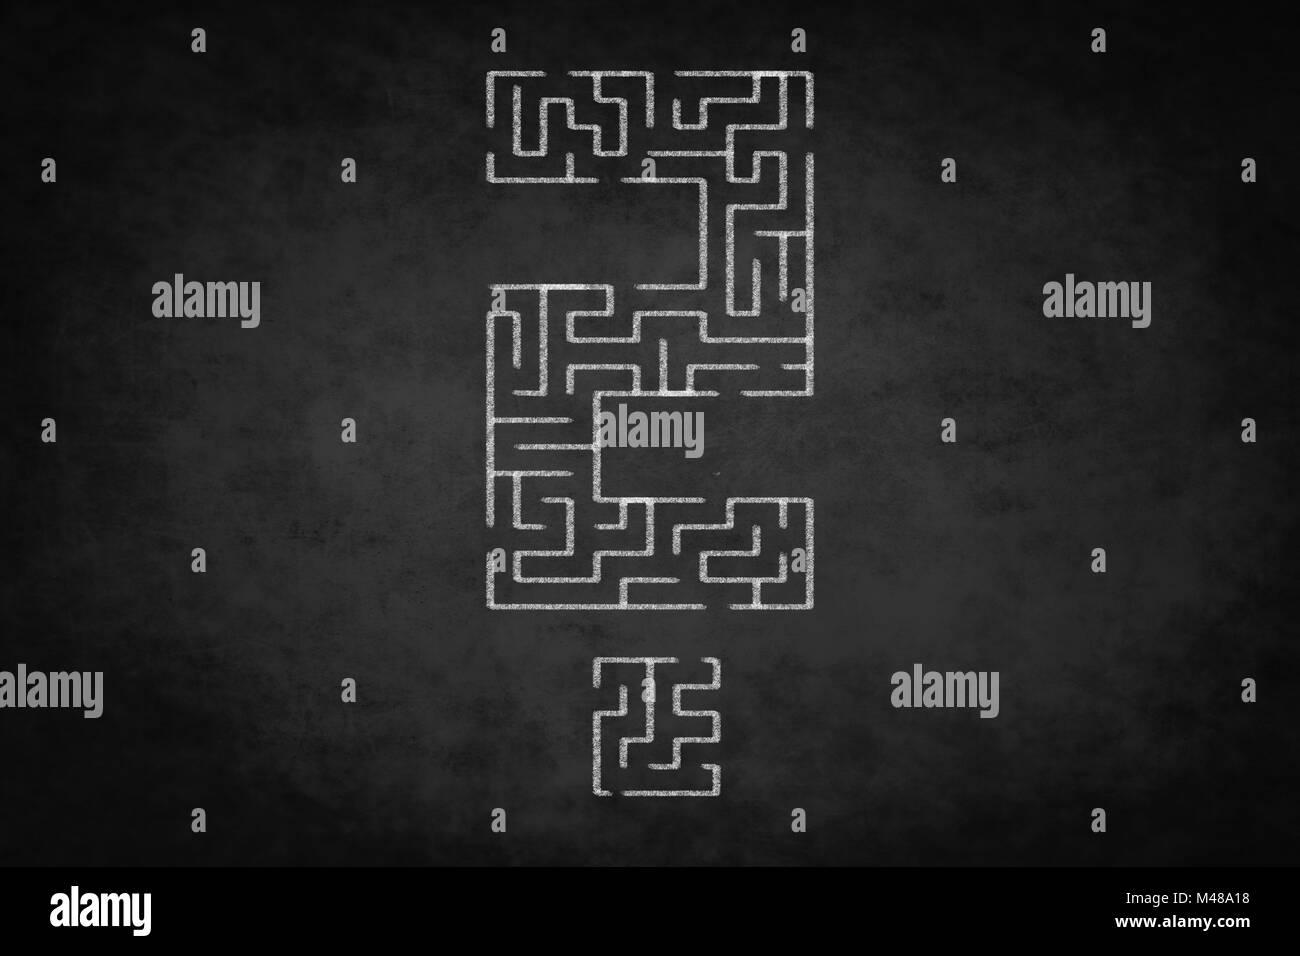 question mark, problem concept - labyrinth  illustration - Stock Image